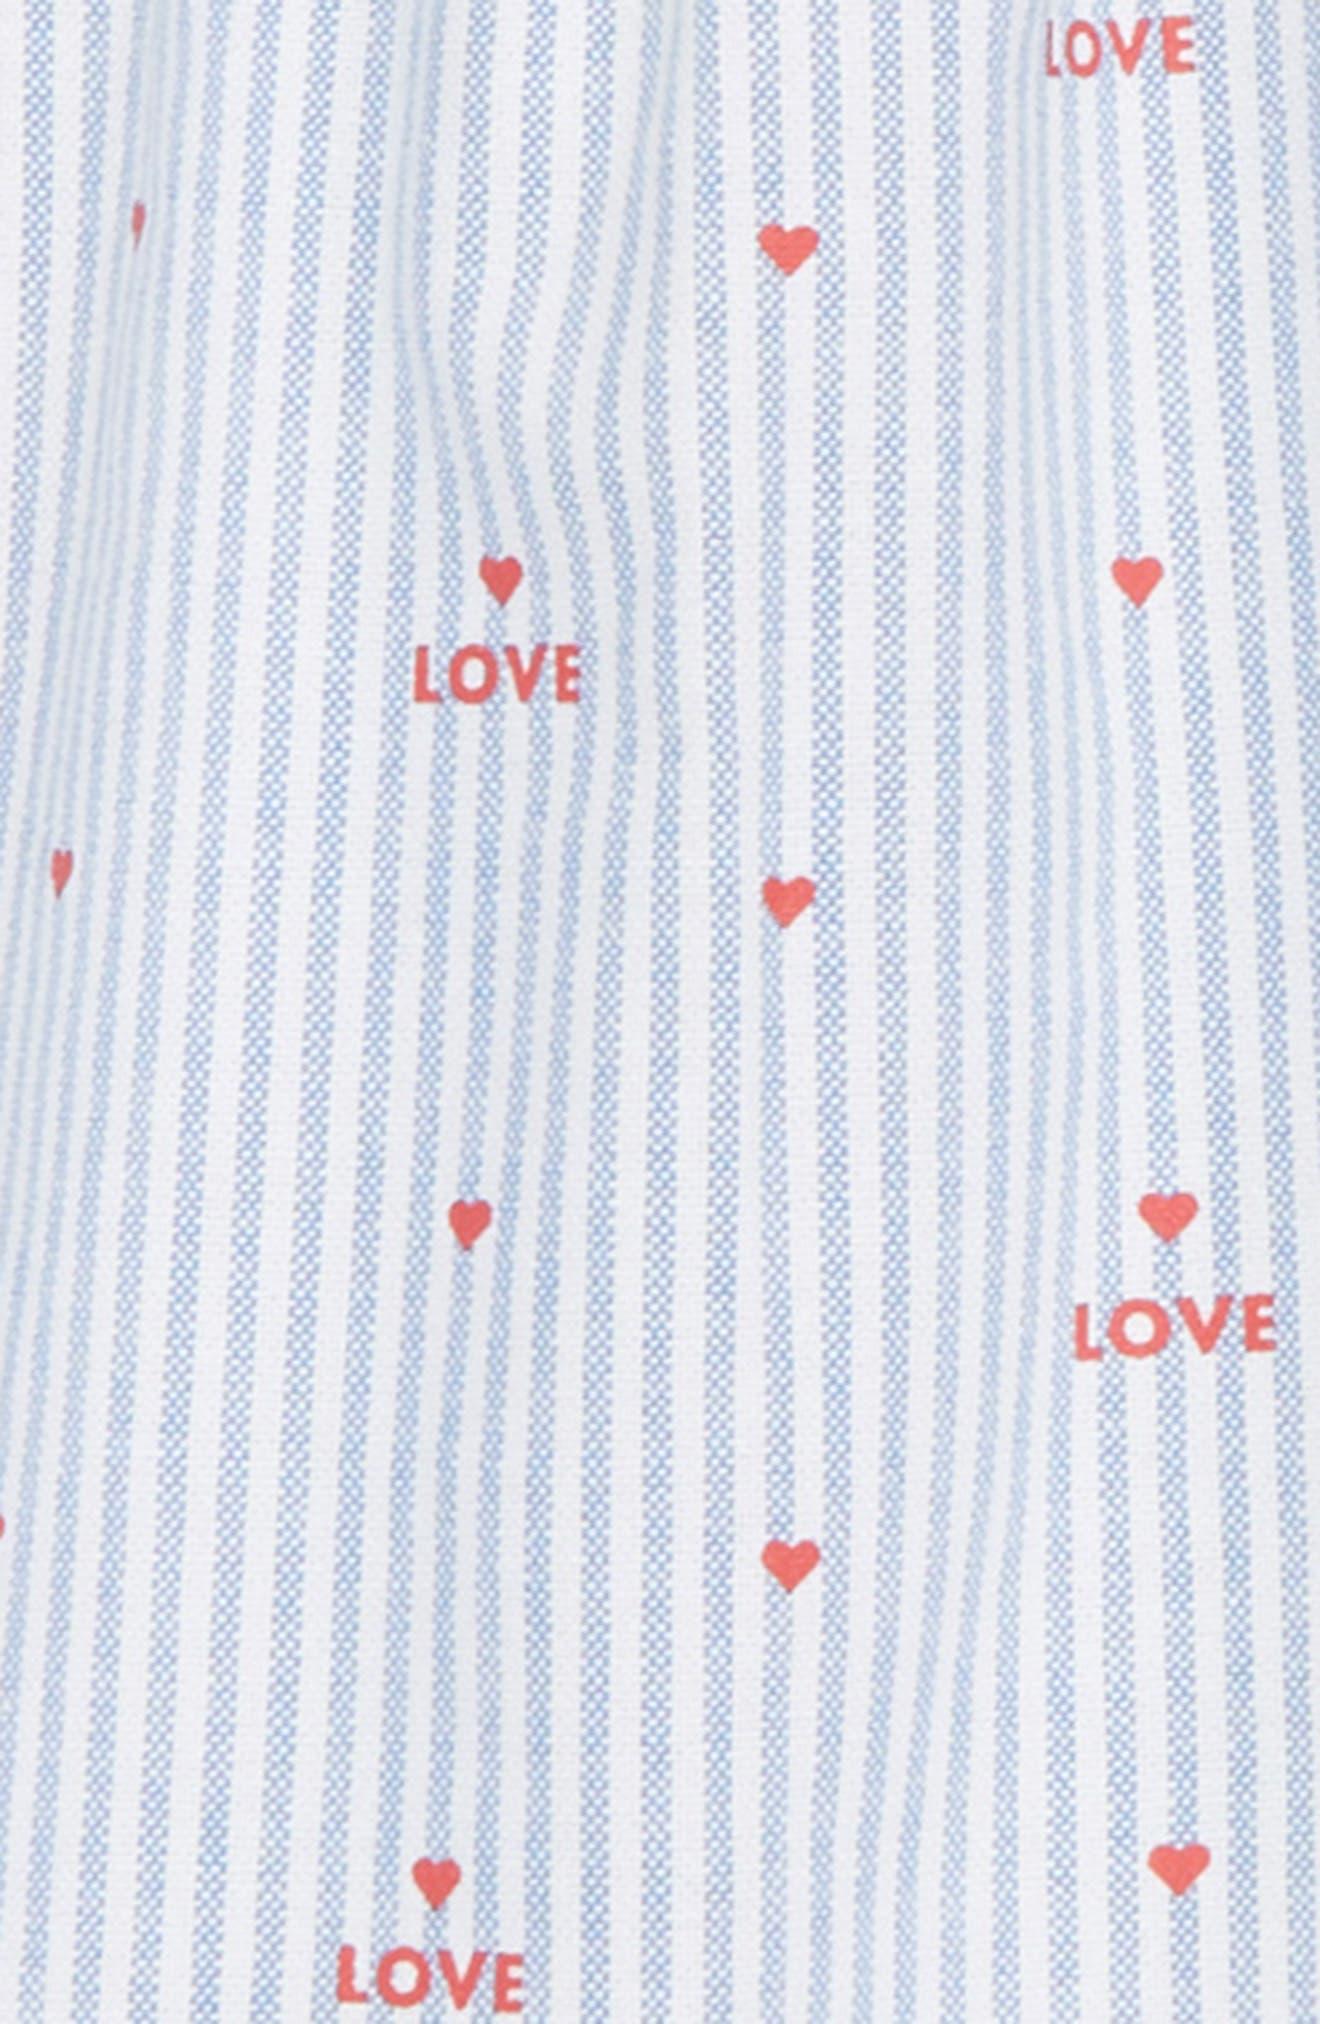 Pinstripe Swing Dress,                             Alternate thumbnail 3, color,                             White/ Peach